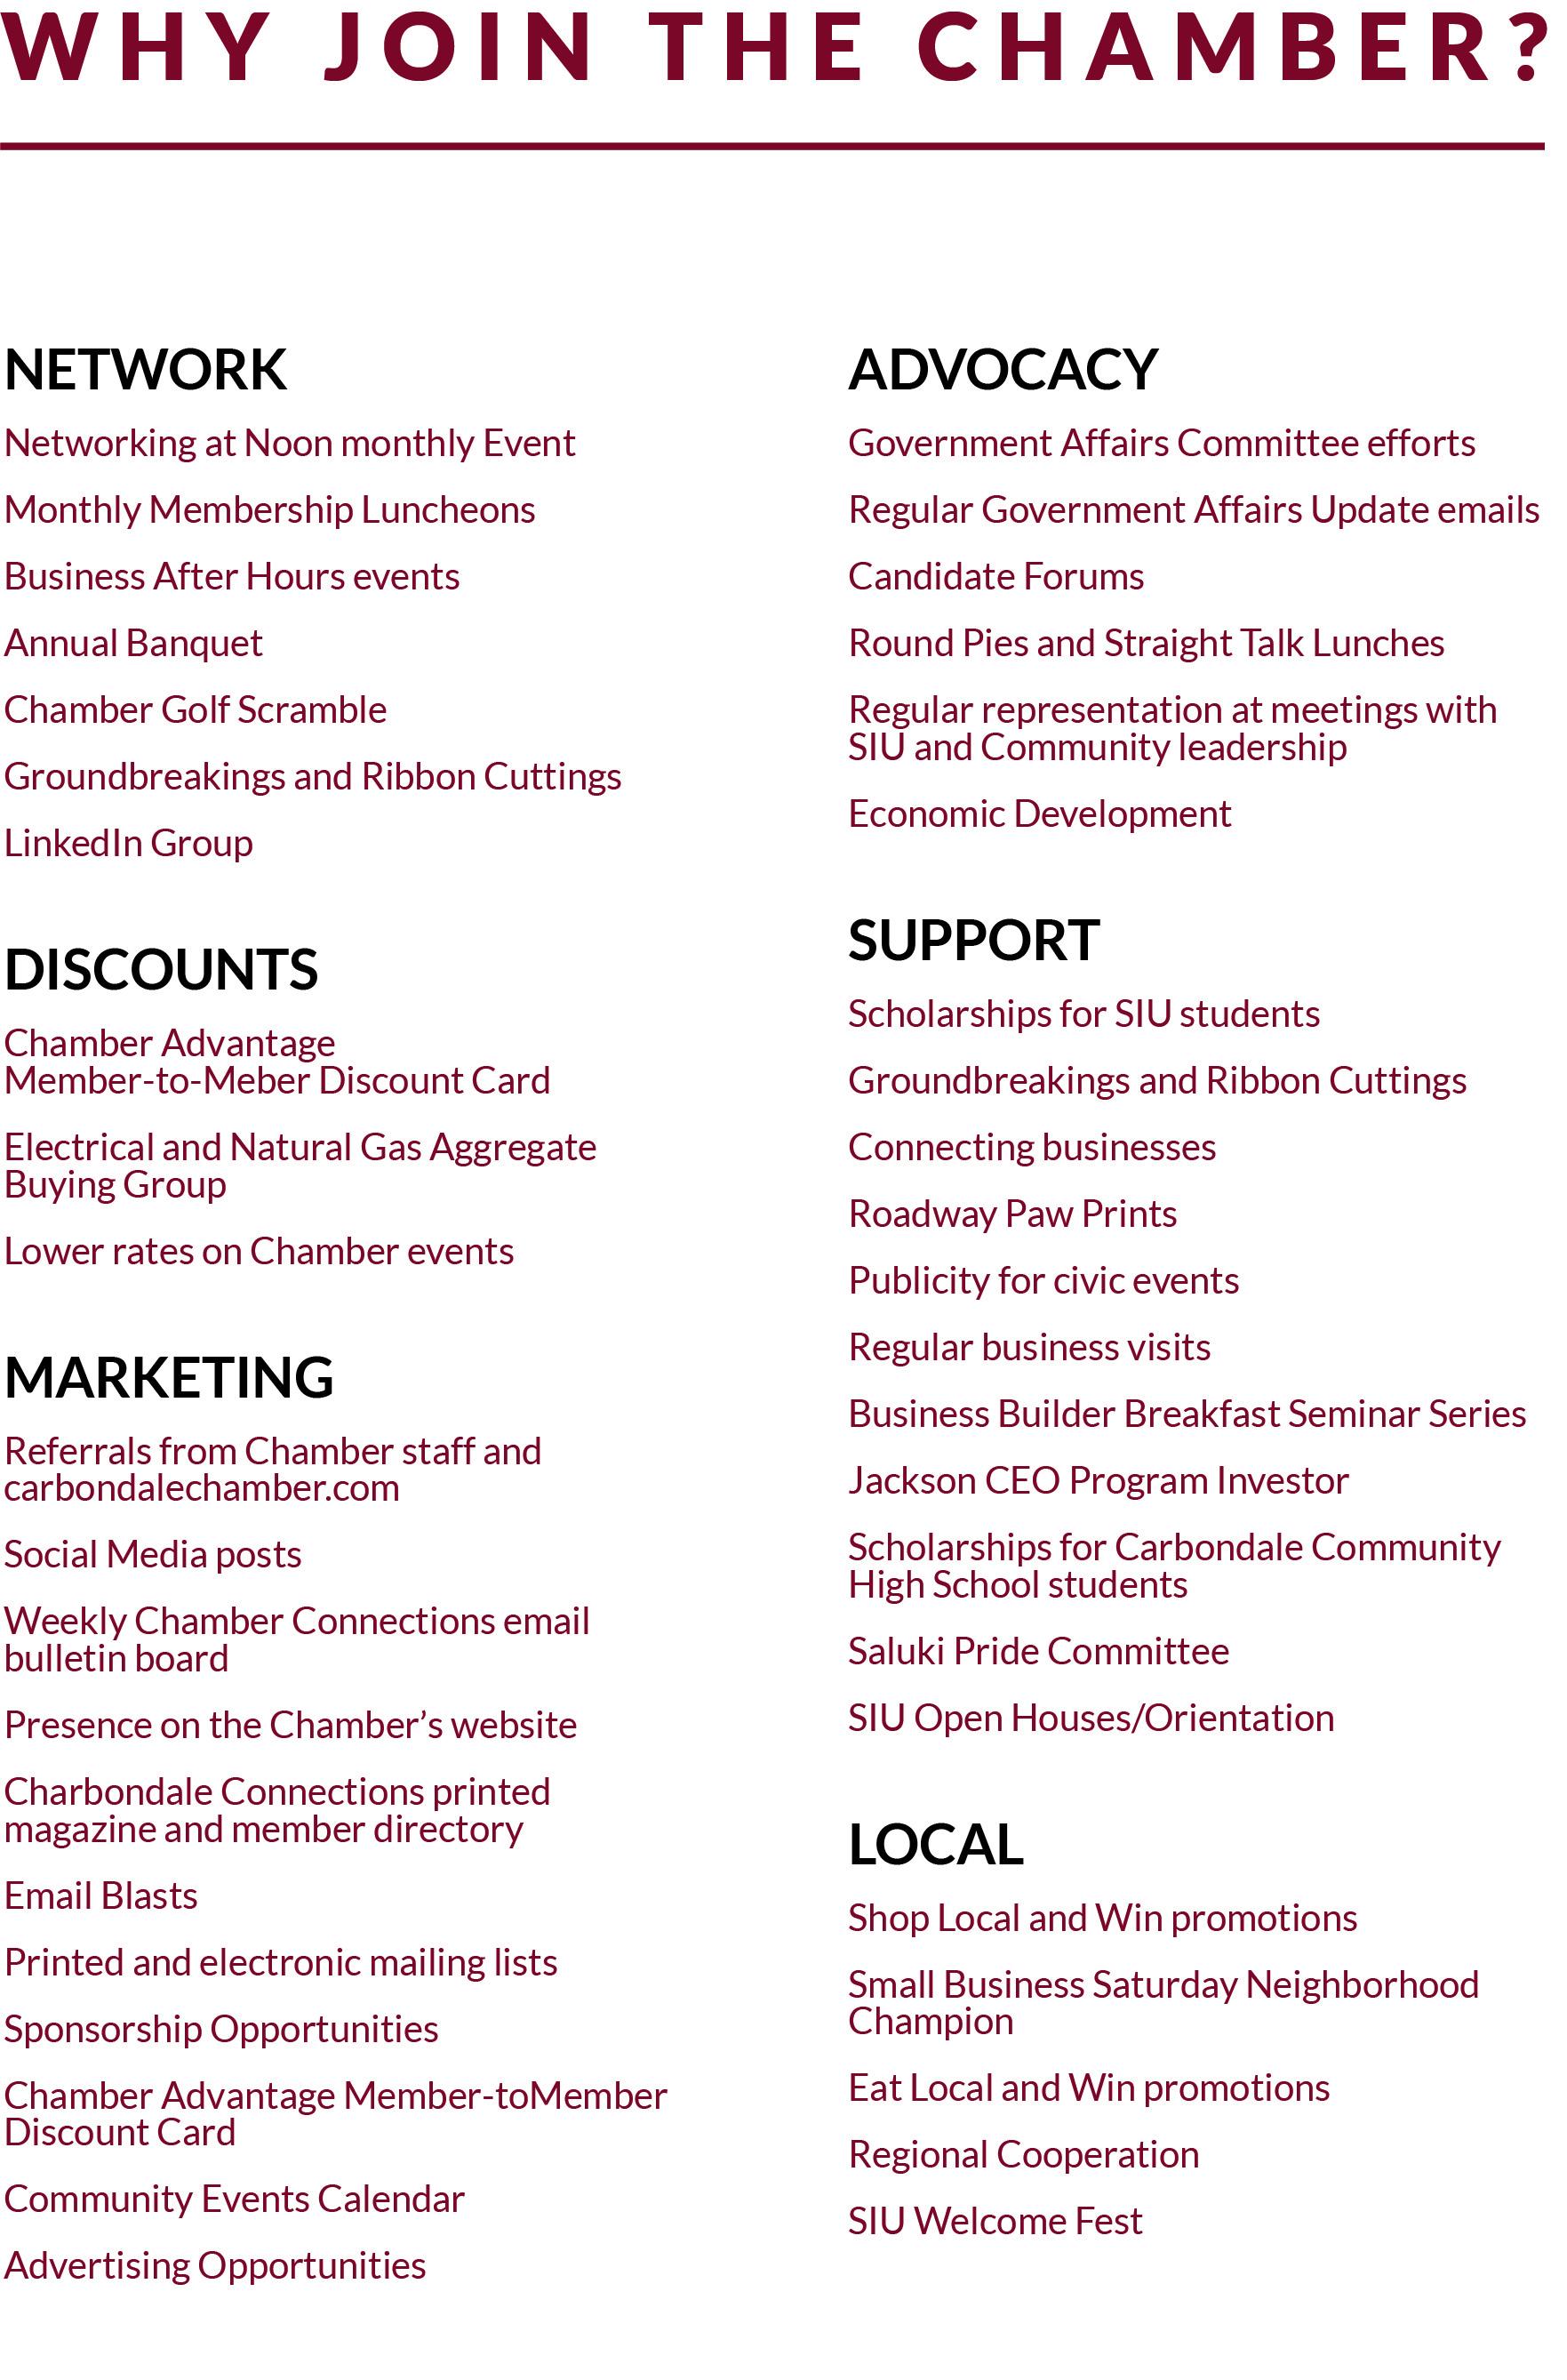 Member-Benefits-2.jpg